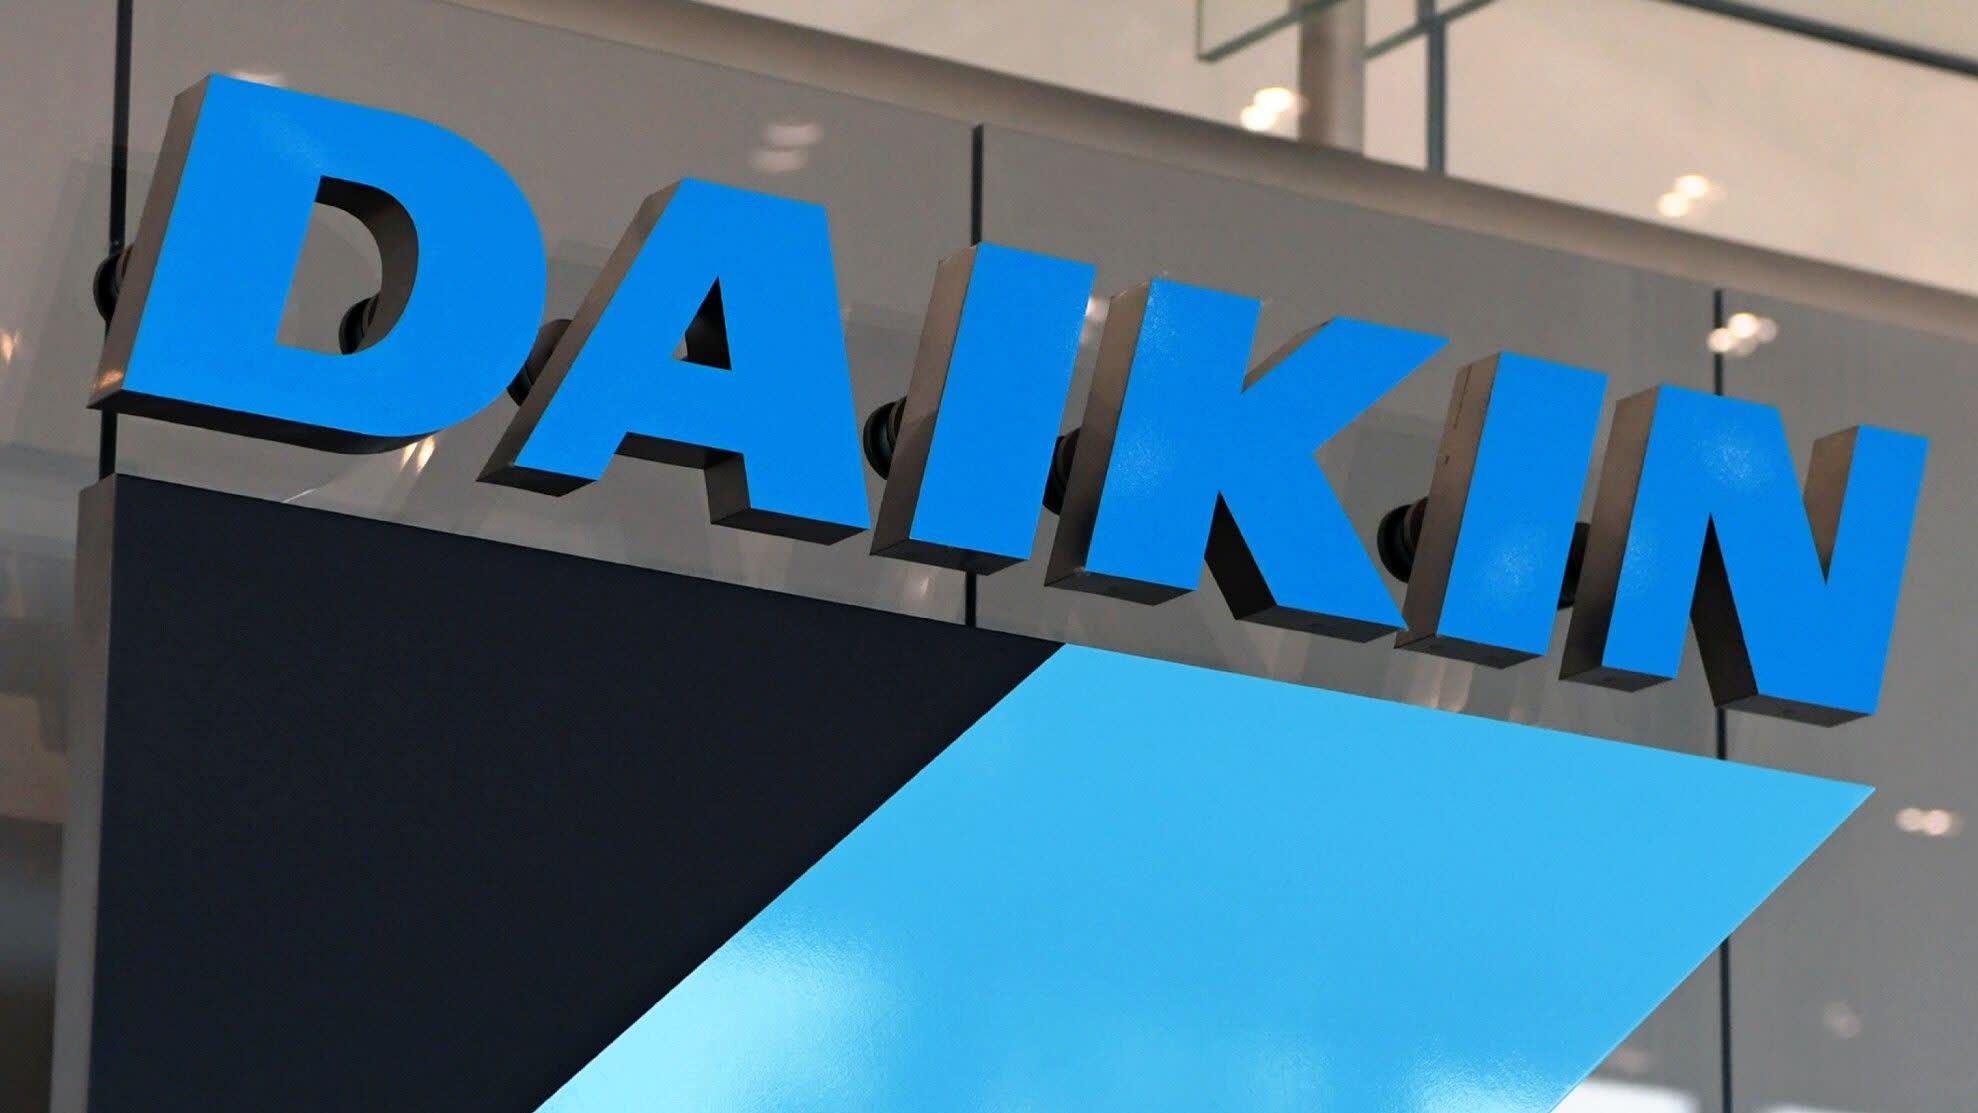 Daikin to buy European refrigerator maker in $885m deal - Nikkei